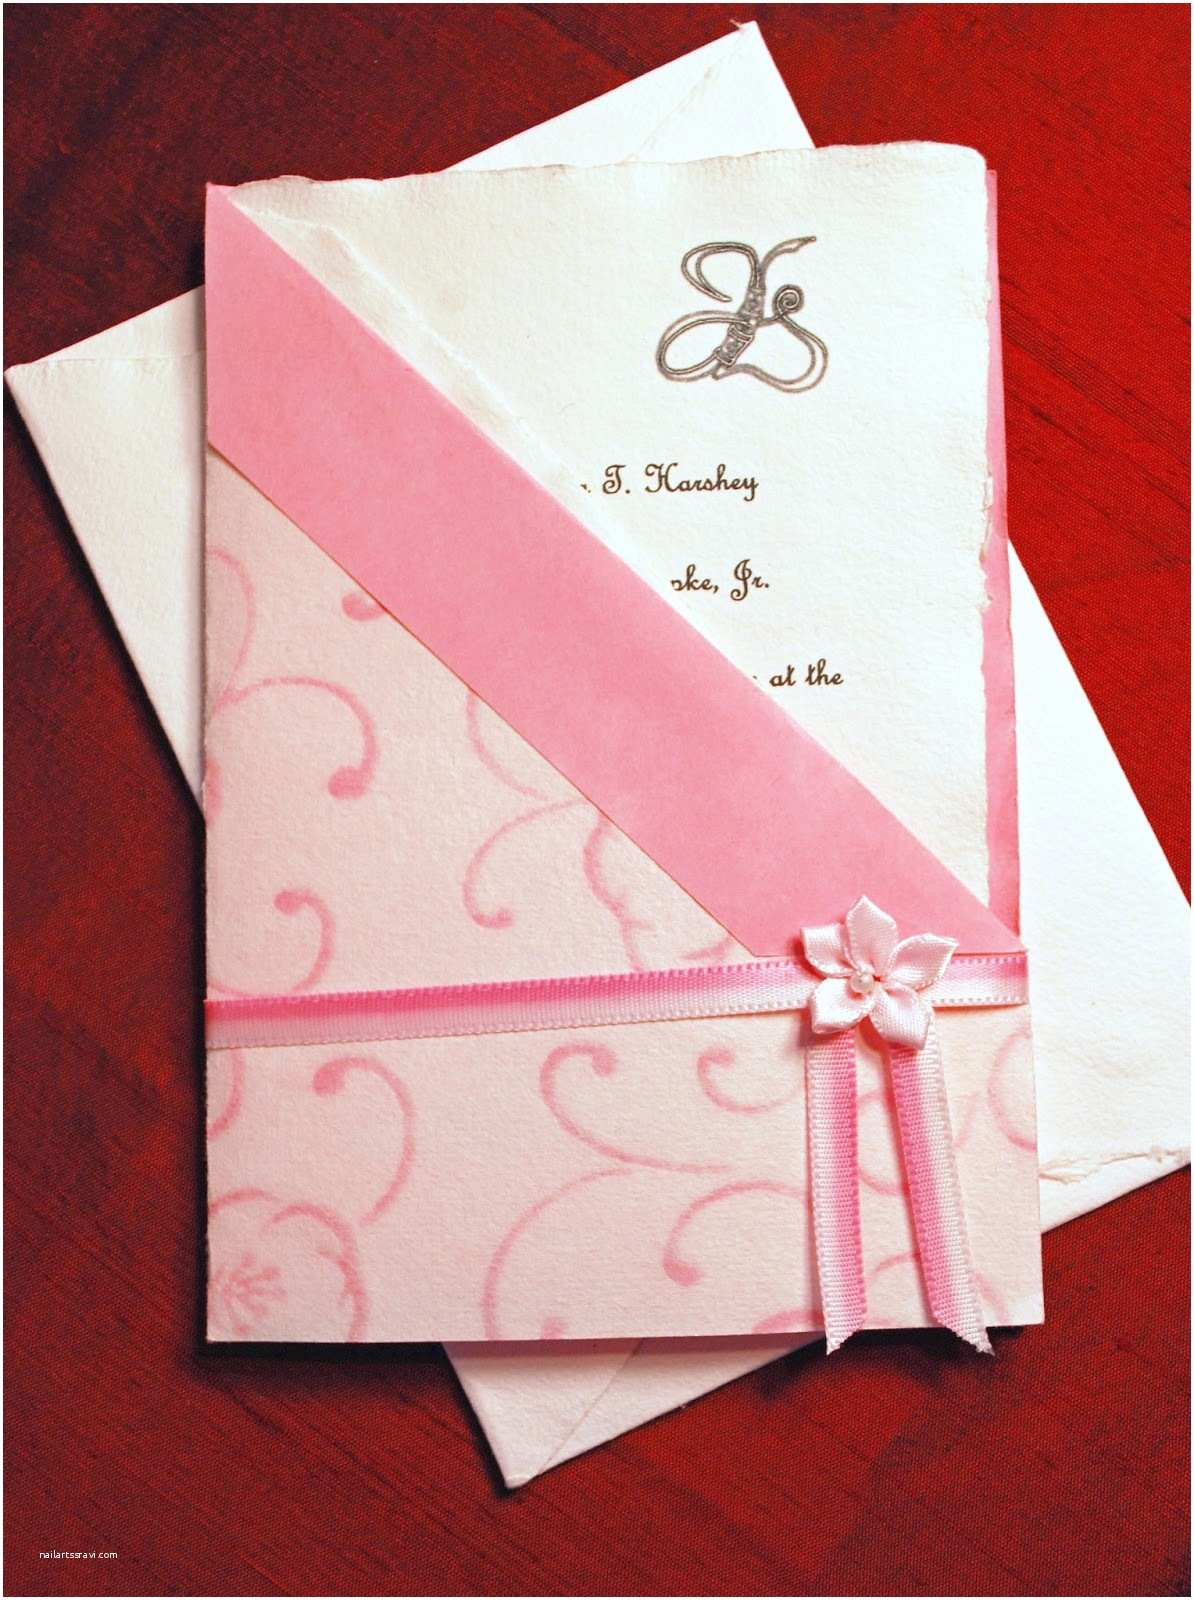 Envelopes for Wedding Invitations Best Album Envelopes for Wedding Invitations